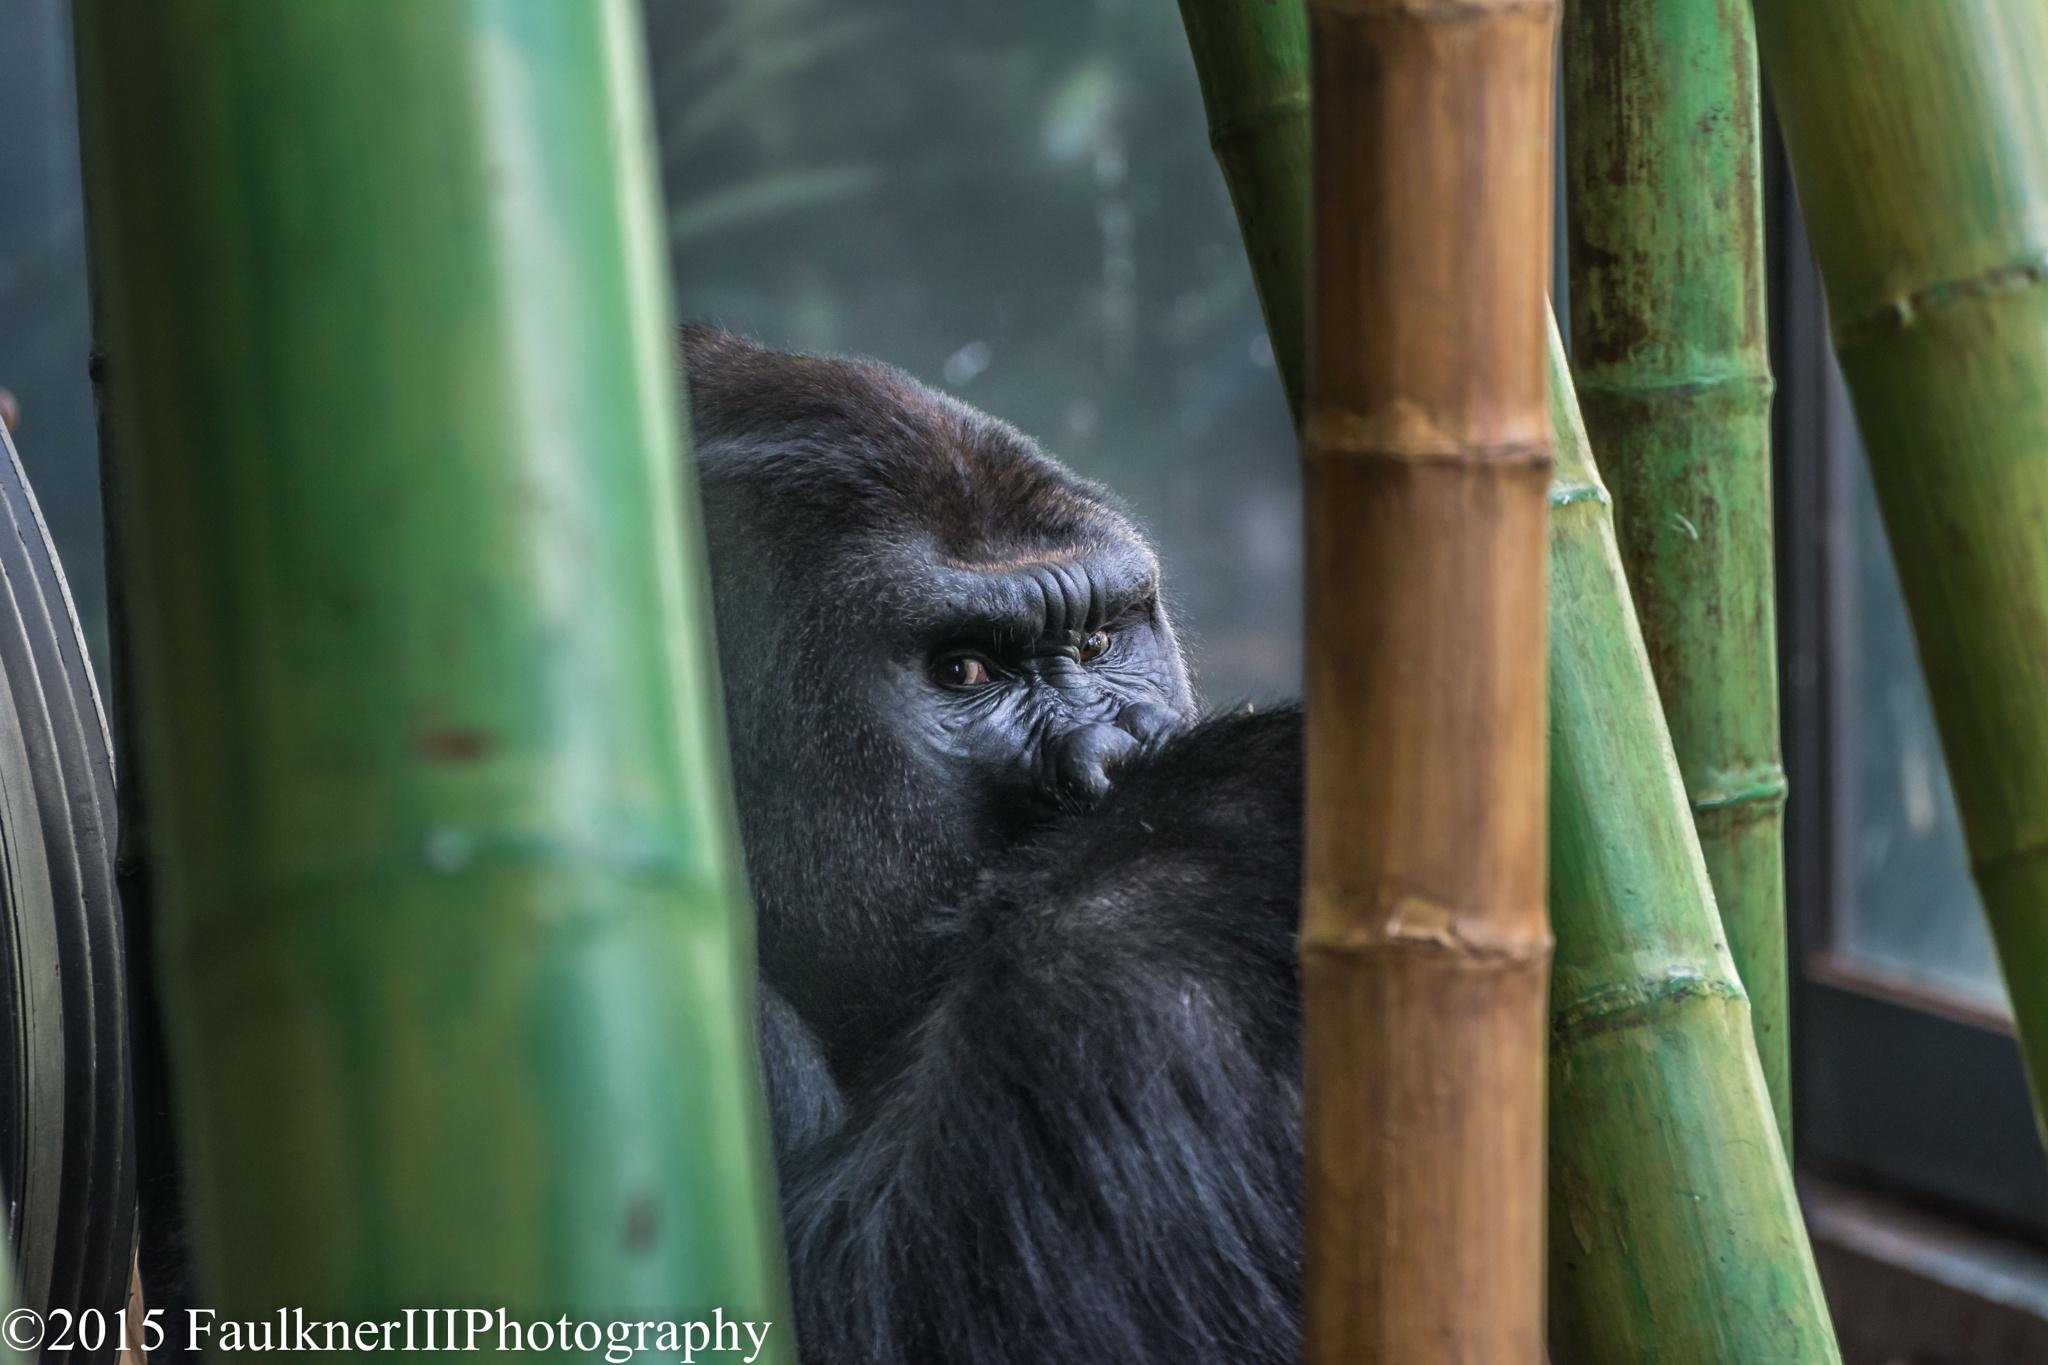 gorilla-1 by Frederick Faulkner III